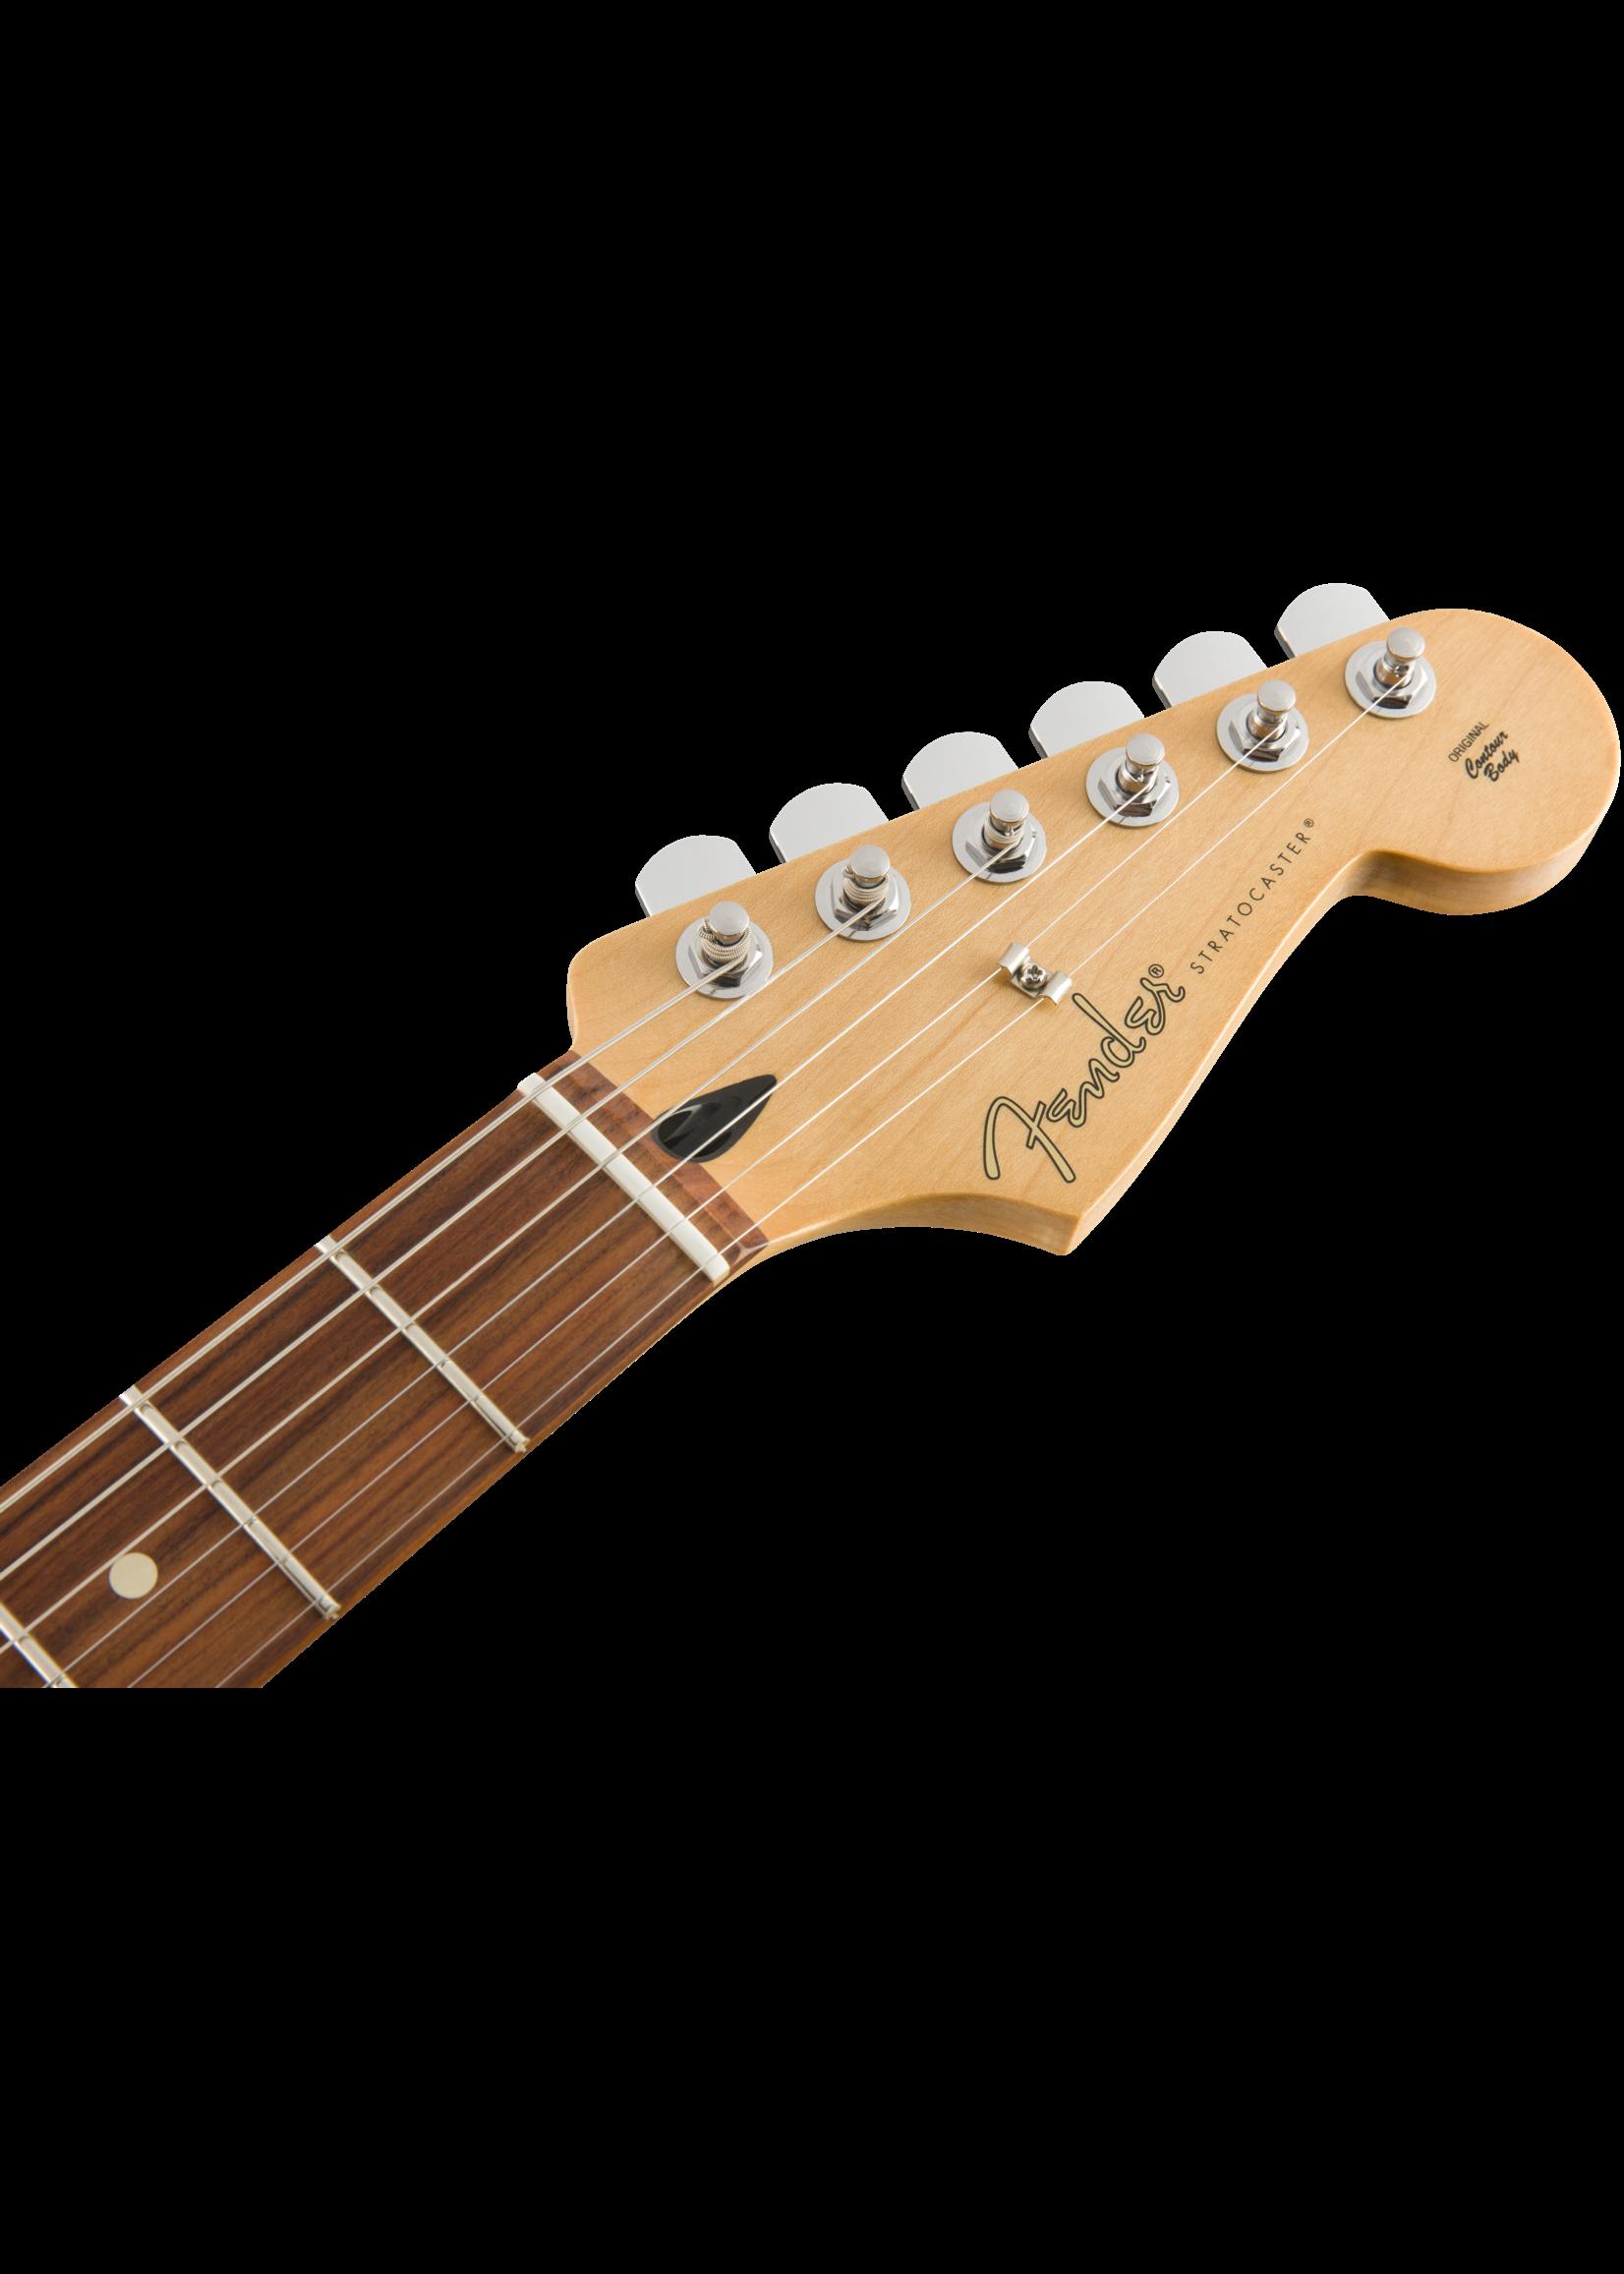 Fender Fender Player Stratocaster with Pau Ferro Fretboard 3-Color Sunburst